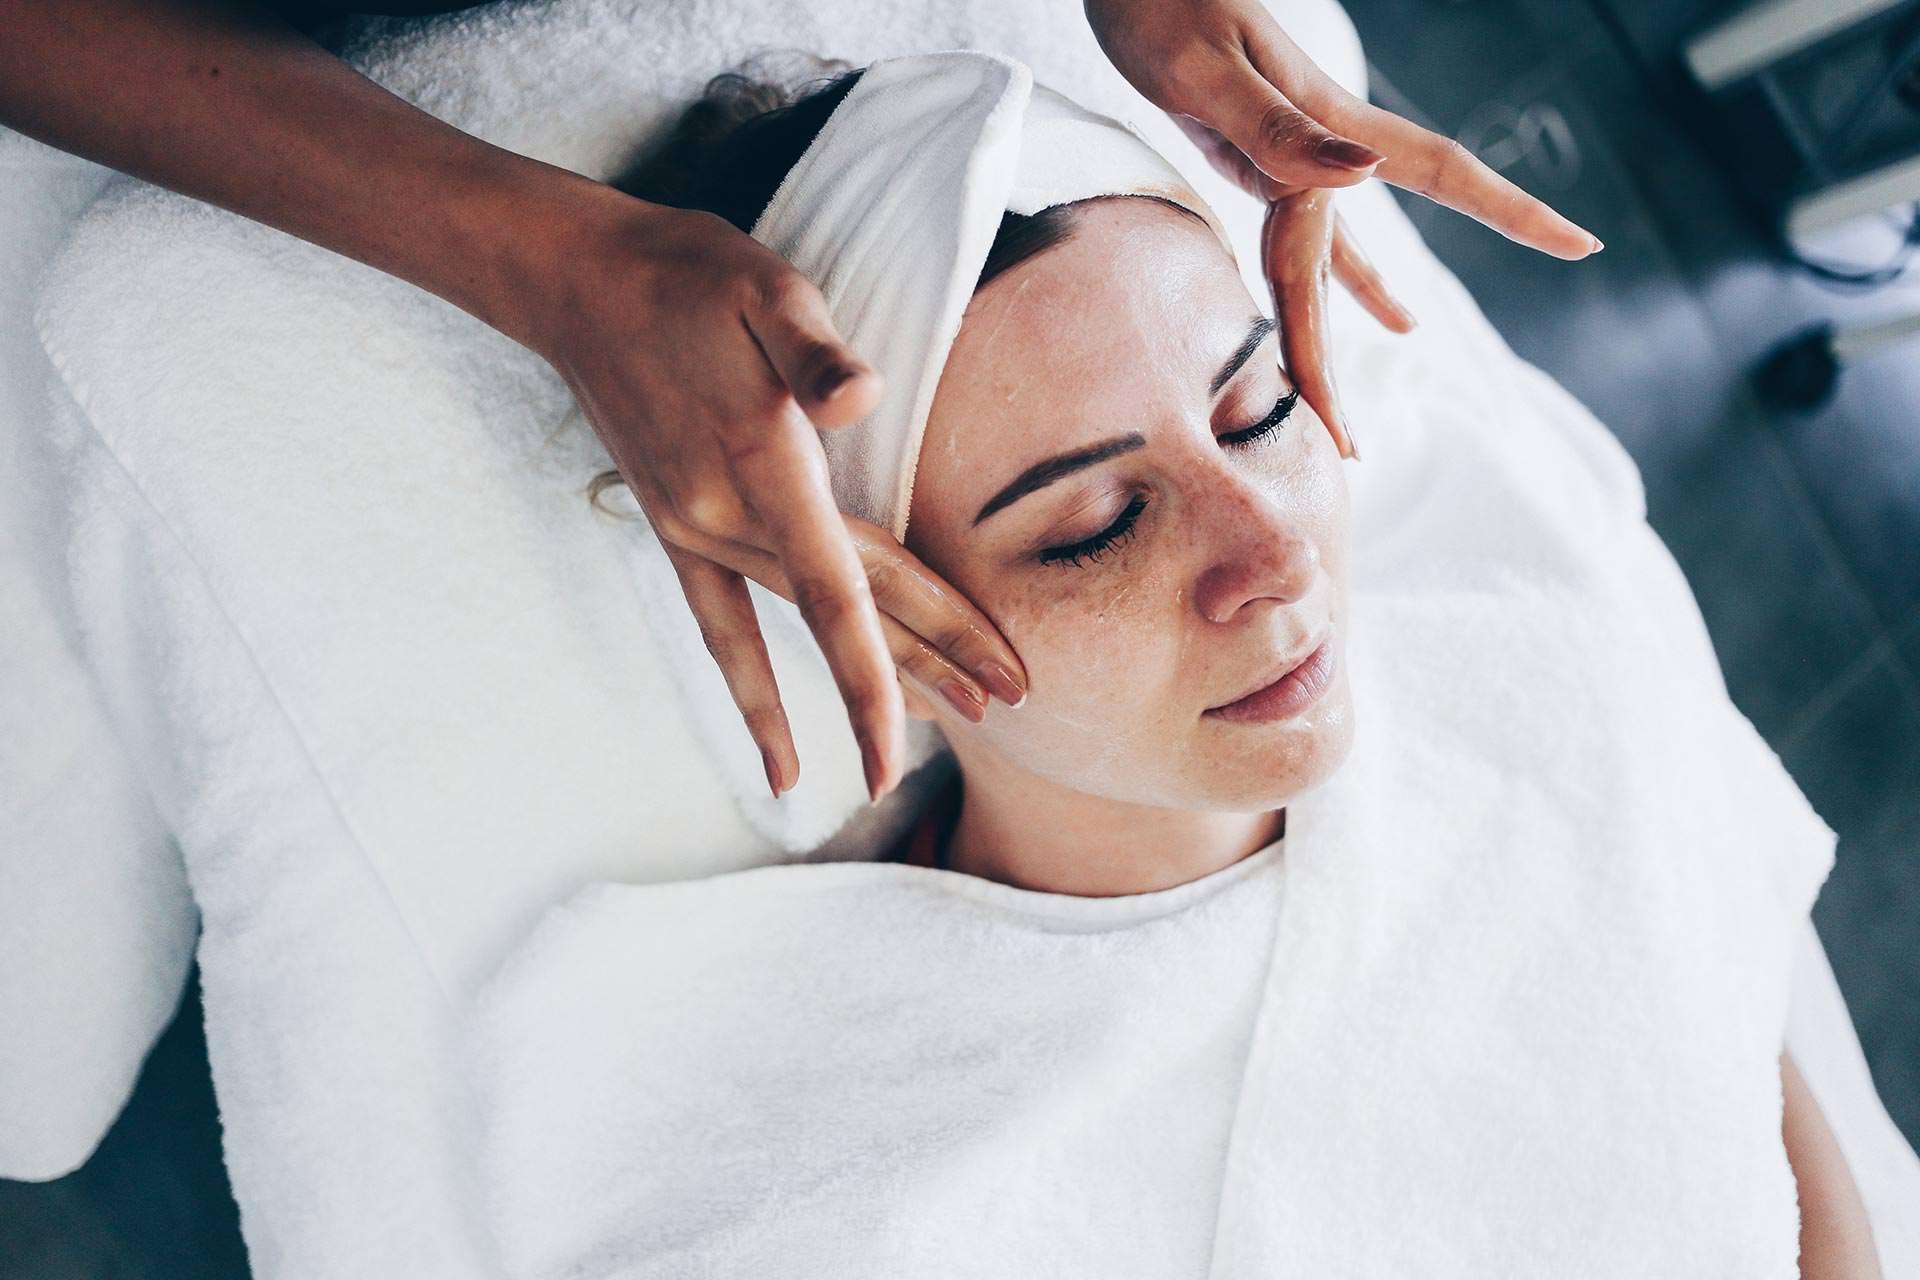 Microdermabrasion und Laserbehandlung für feinporige straffe Haut, Gesichtsstraffung ohne OP, Microdermabrasion Erfahrungen Innsbruck, Beauty Report, Erfahrungsbericht, Beauty Blog, www.whoismocca.com